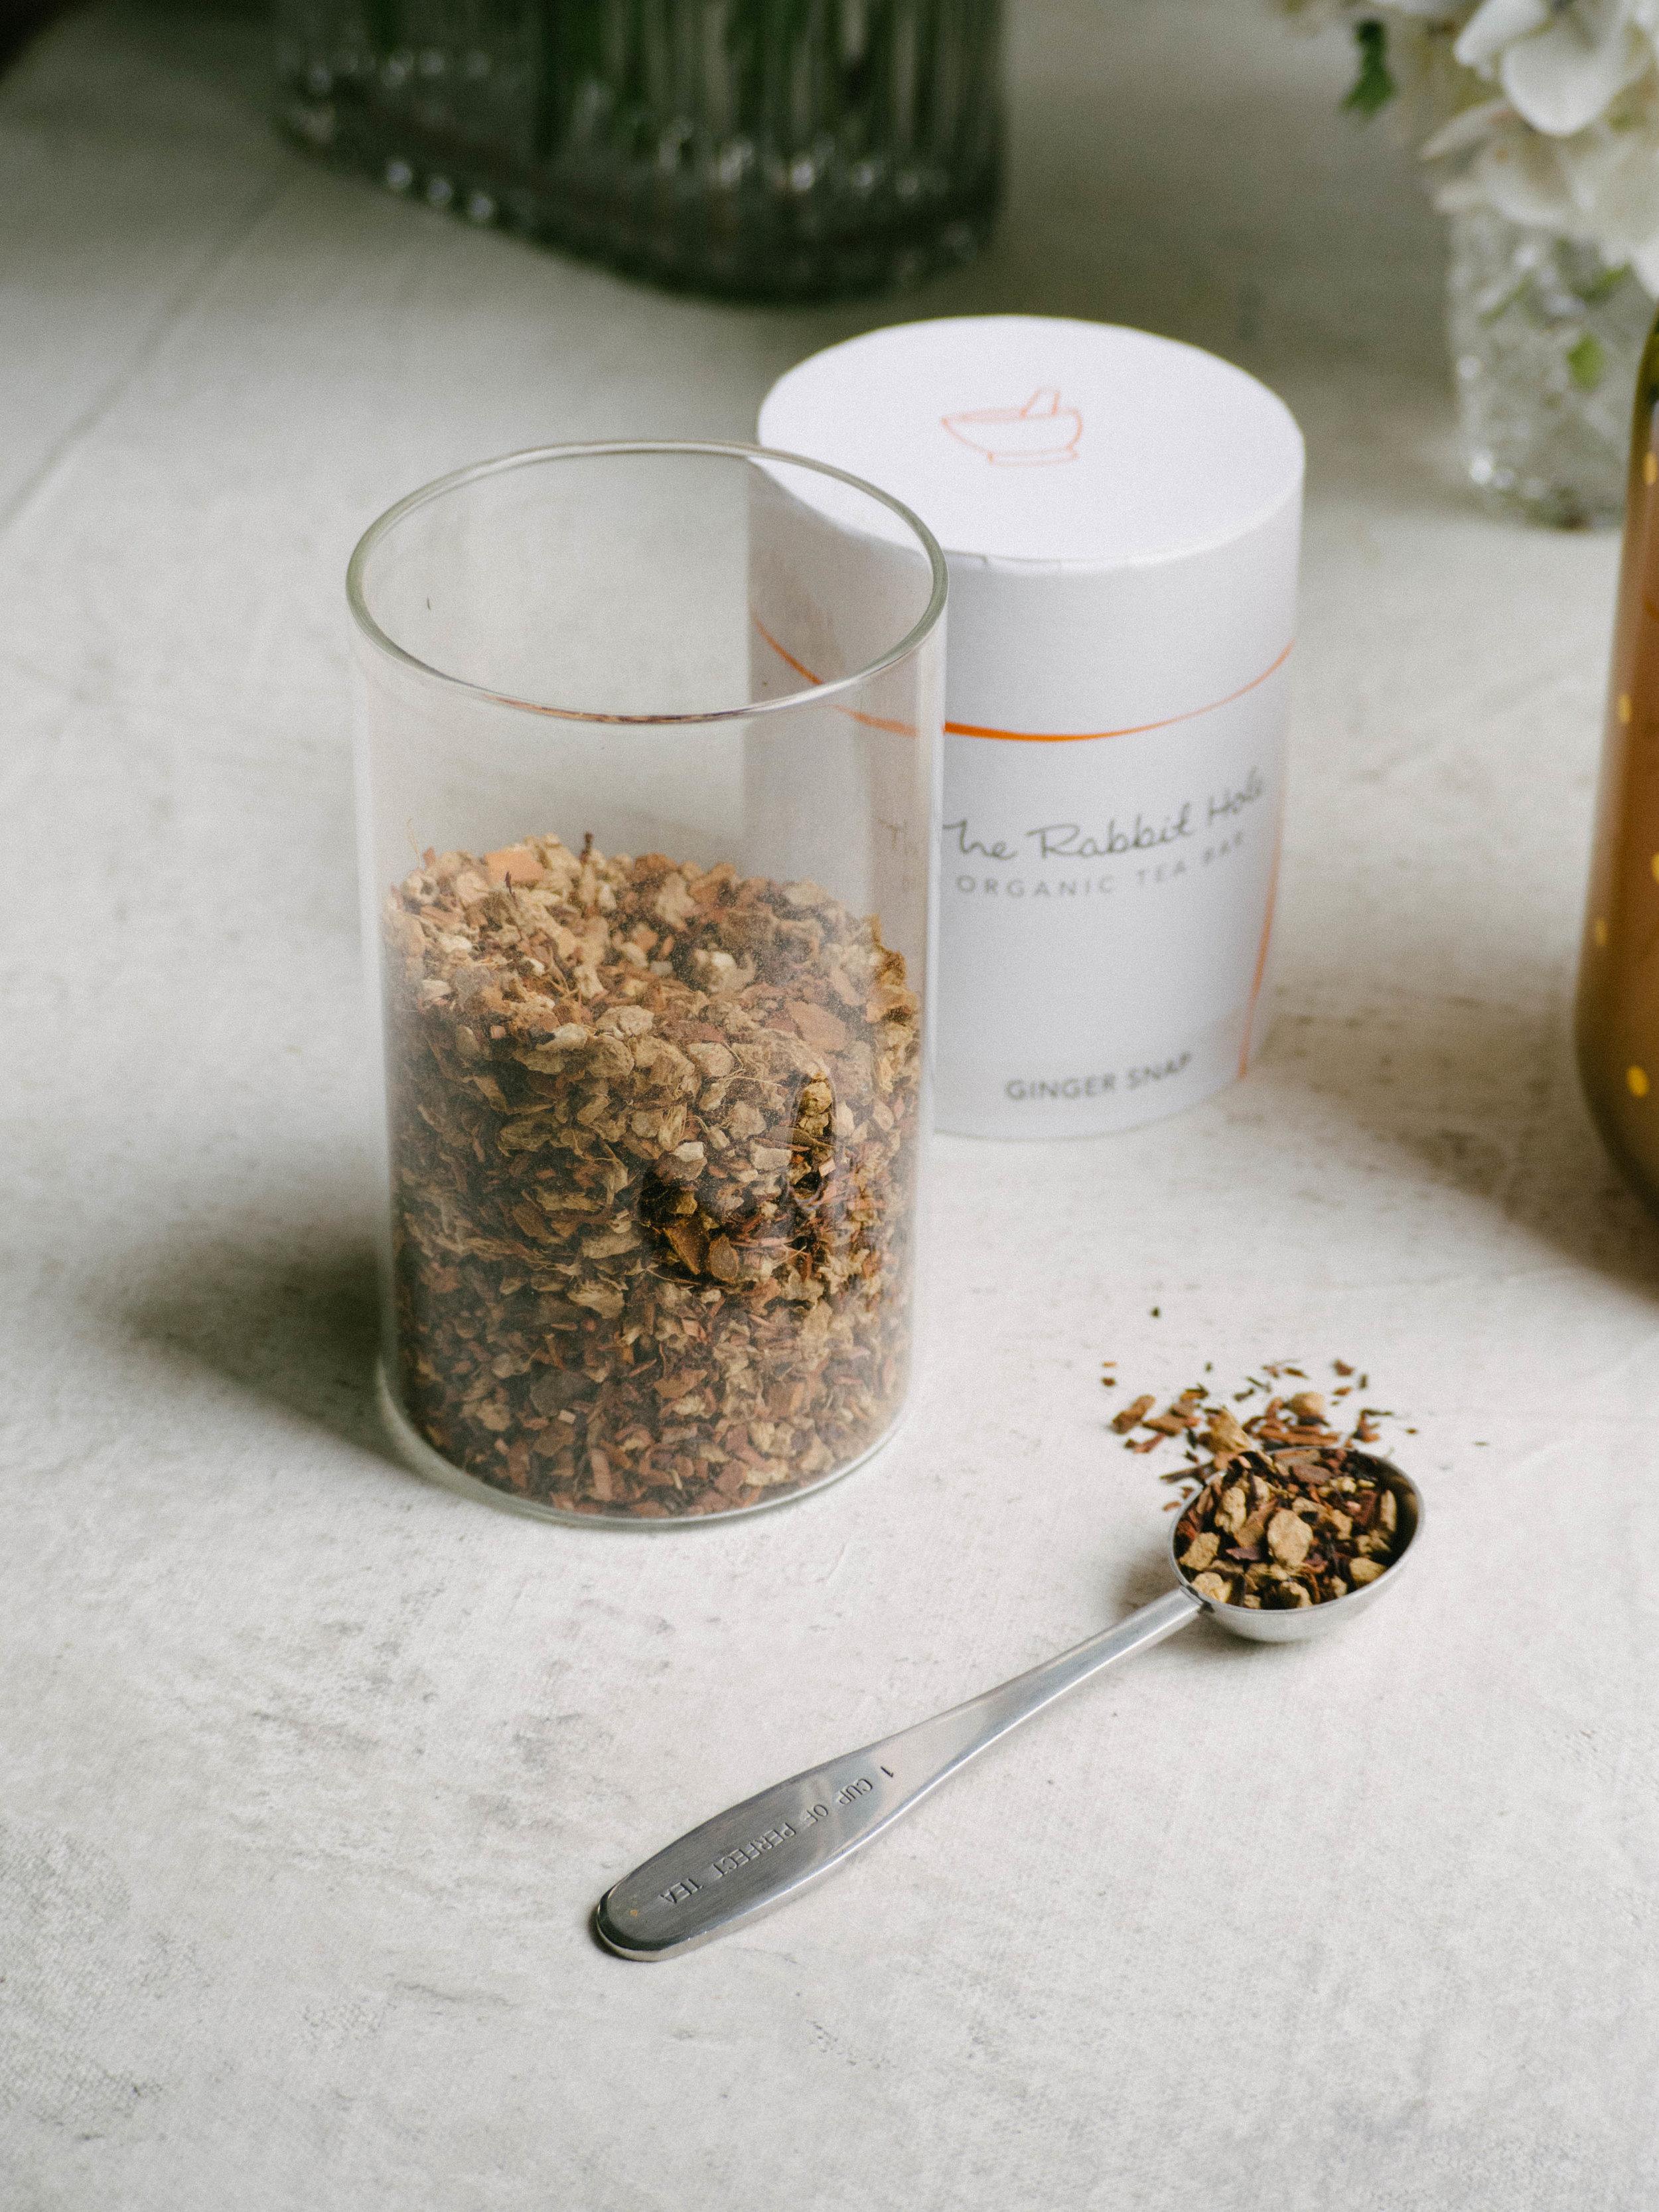 Ginger Snap Tea by The Rabbit Hole Organic Tea Bar